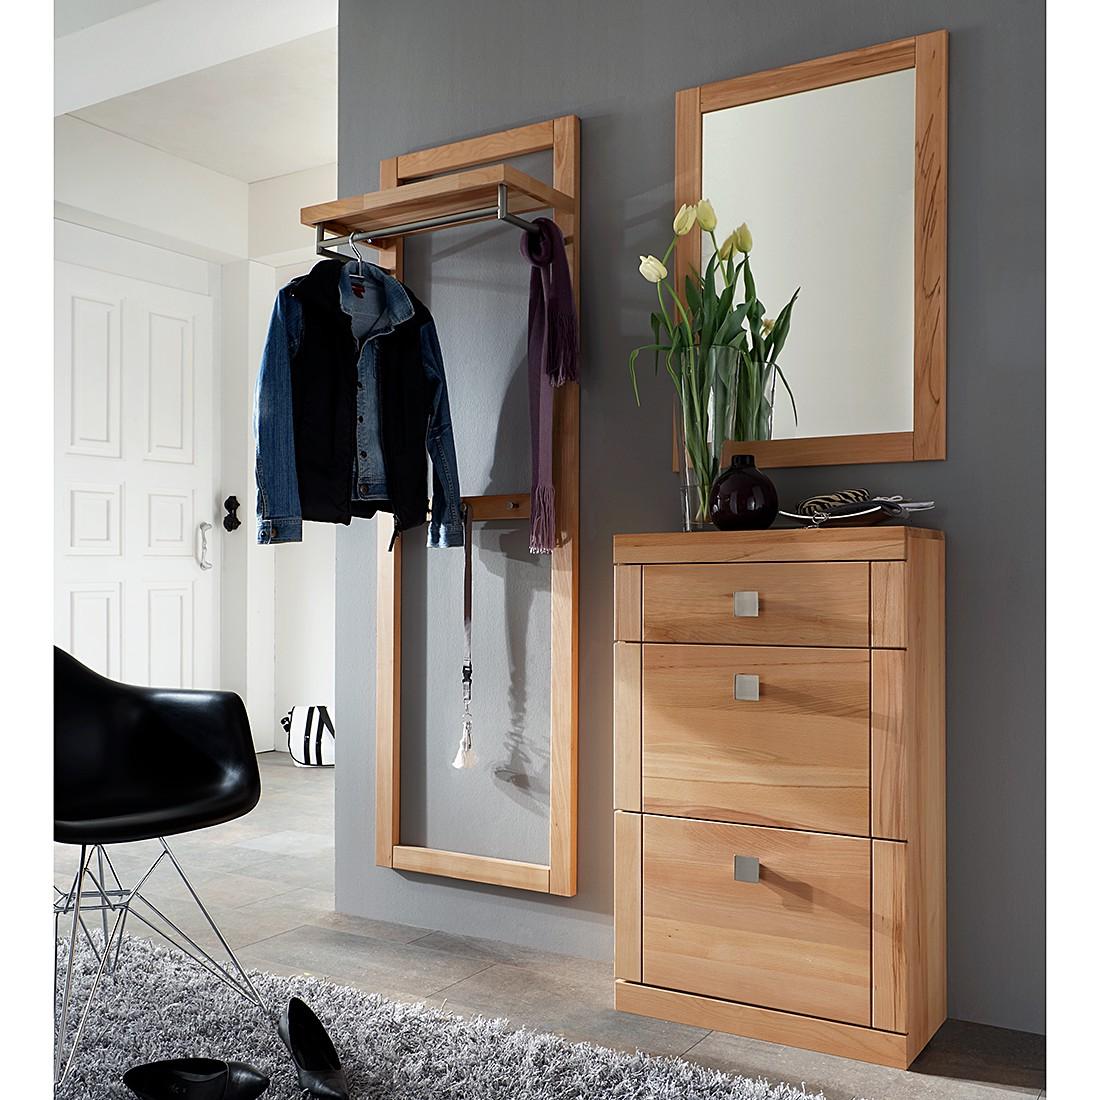 garderobenset madera kernbuche massiv ge lt jung s hne bestellen. Black Bedroom Furniture Sets. Home Design Ideas